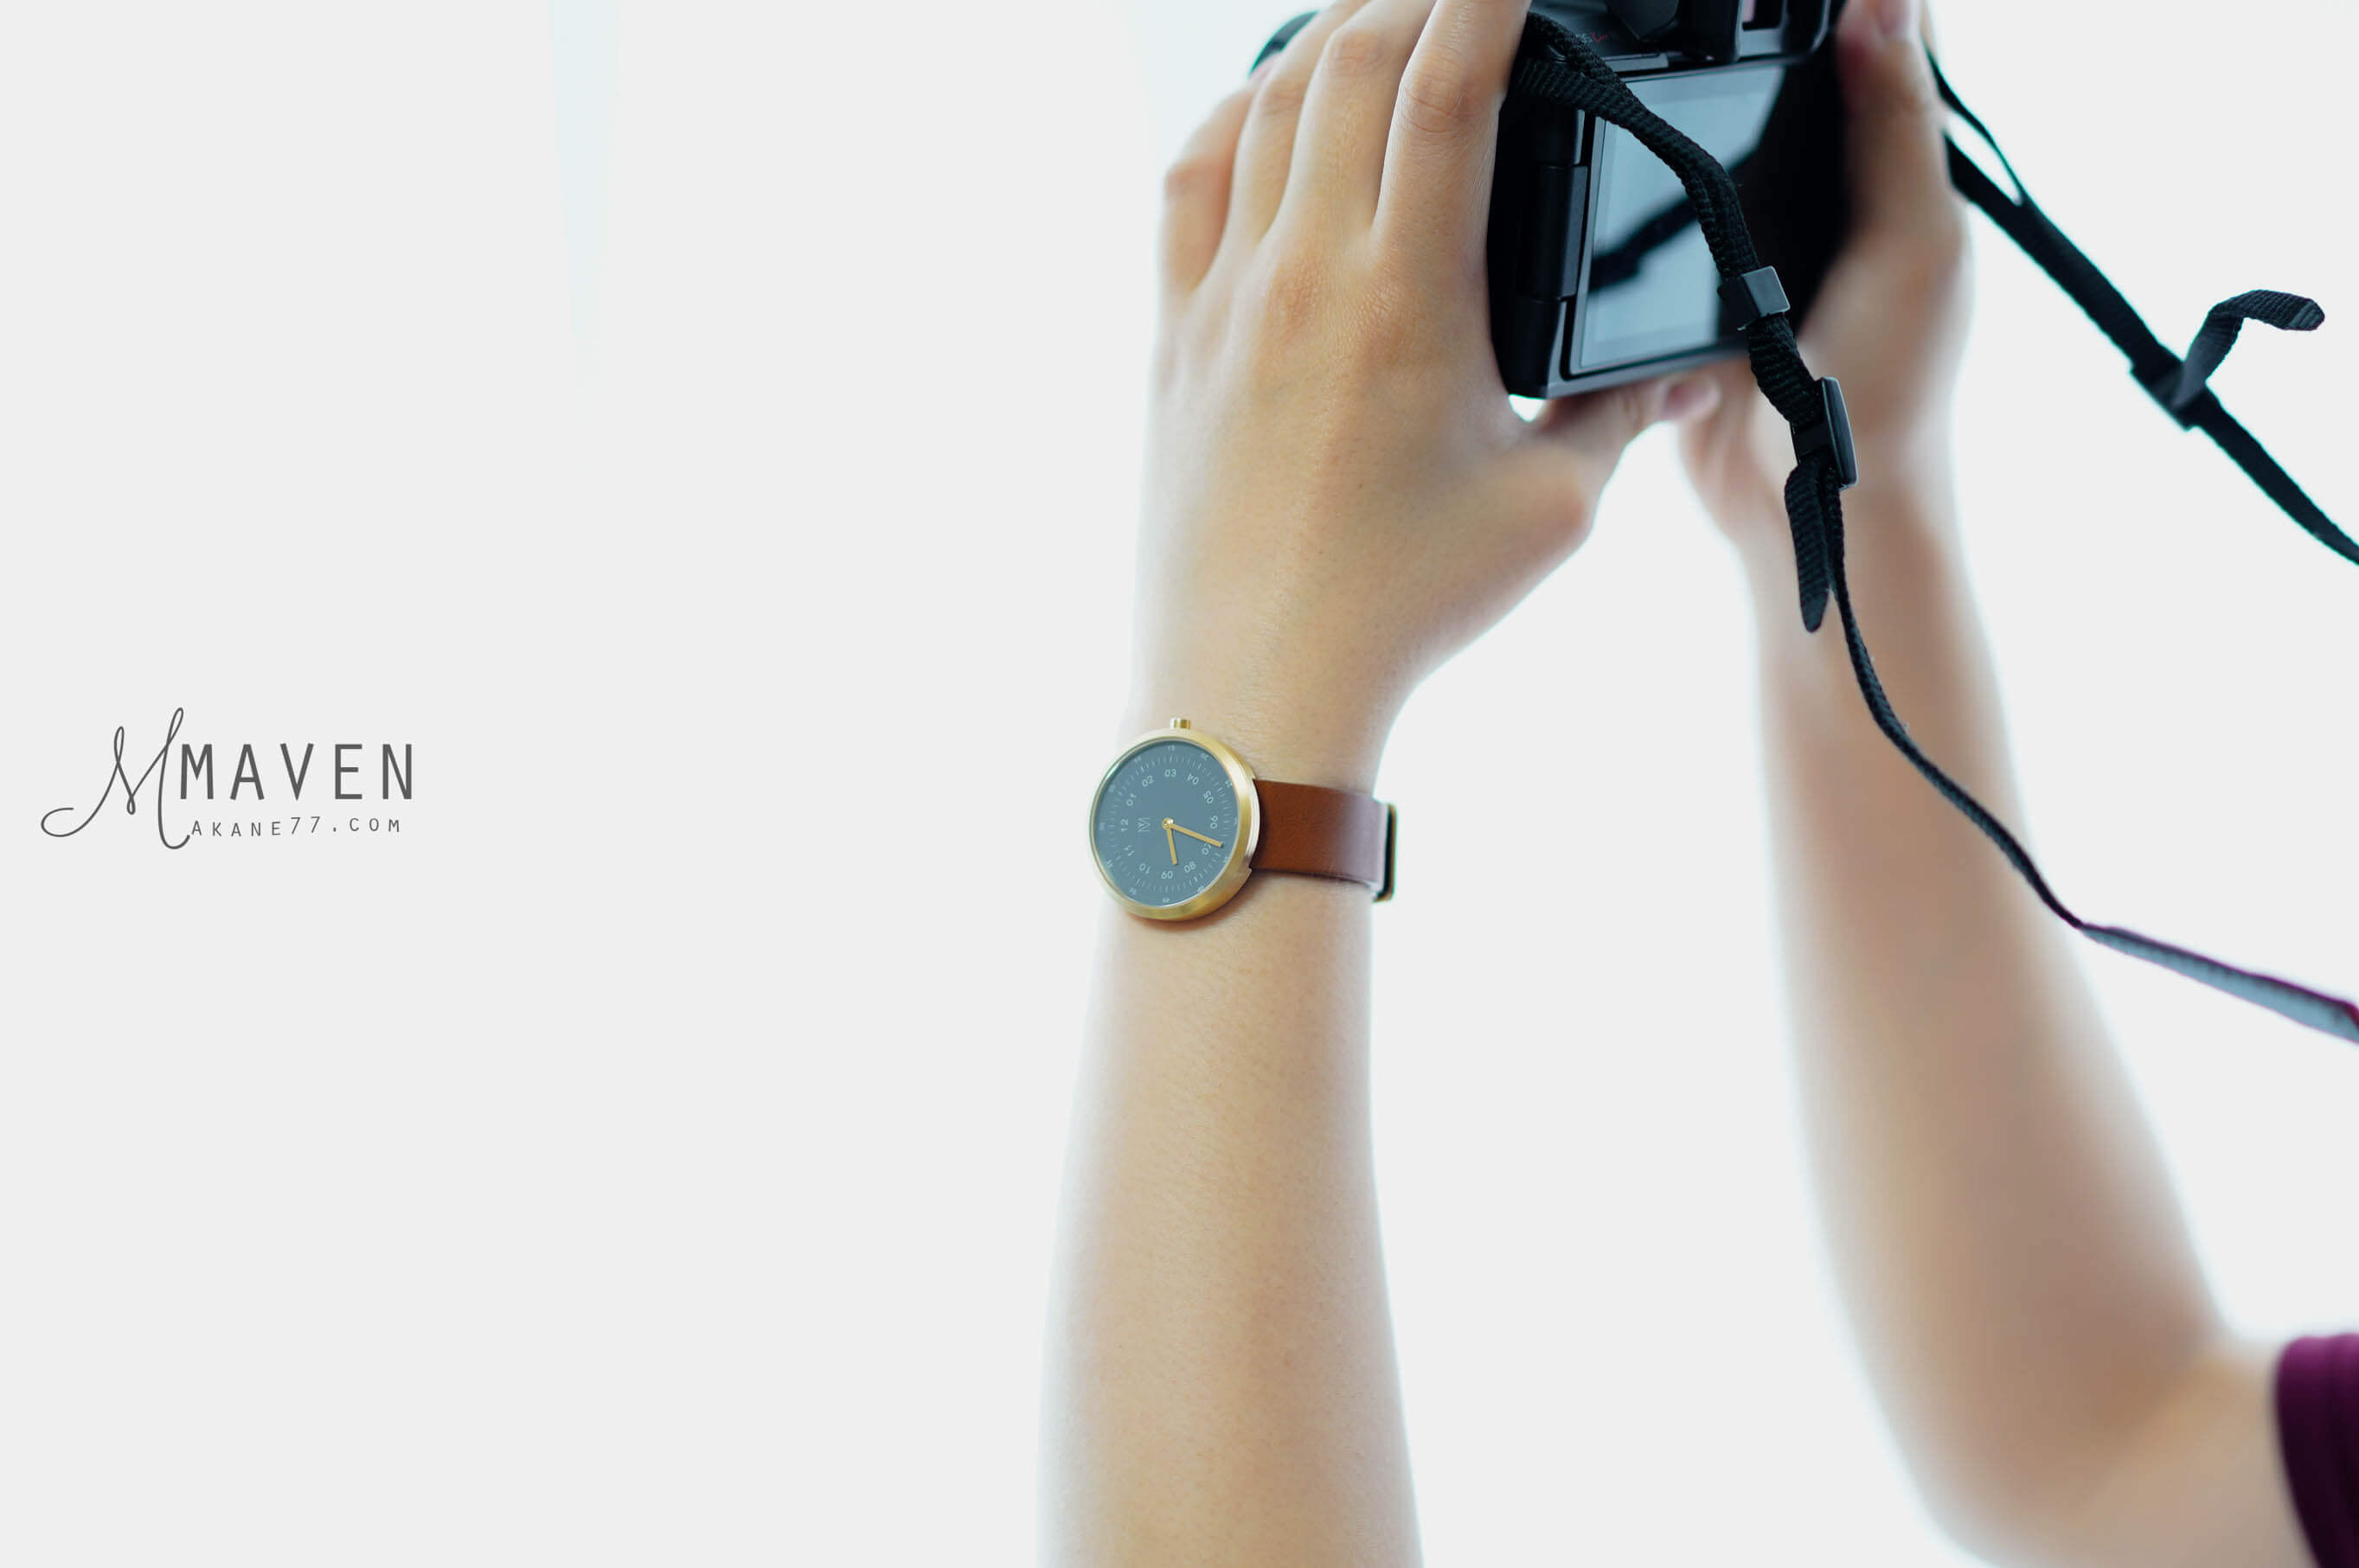 DSC01477-1MAVEN WATCHES 錶